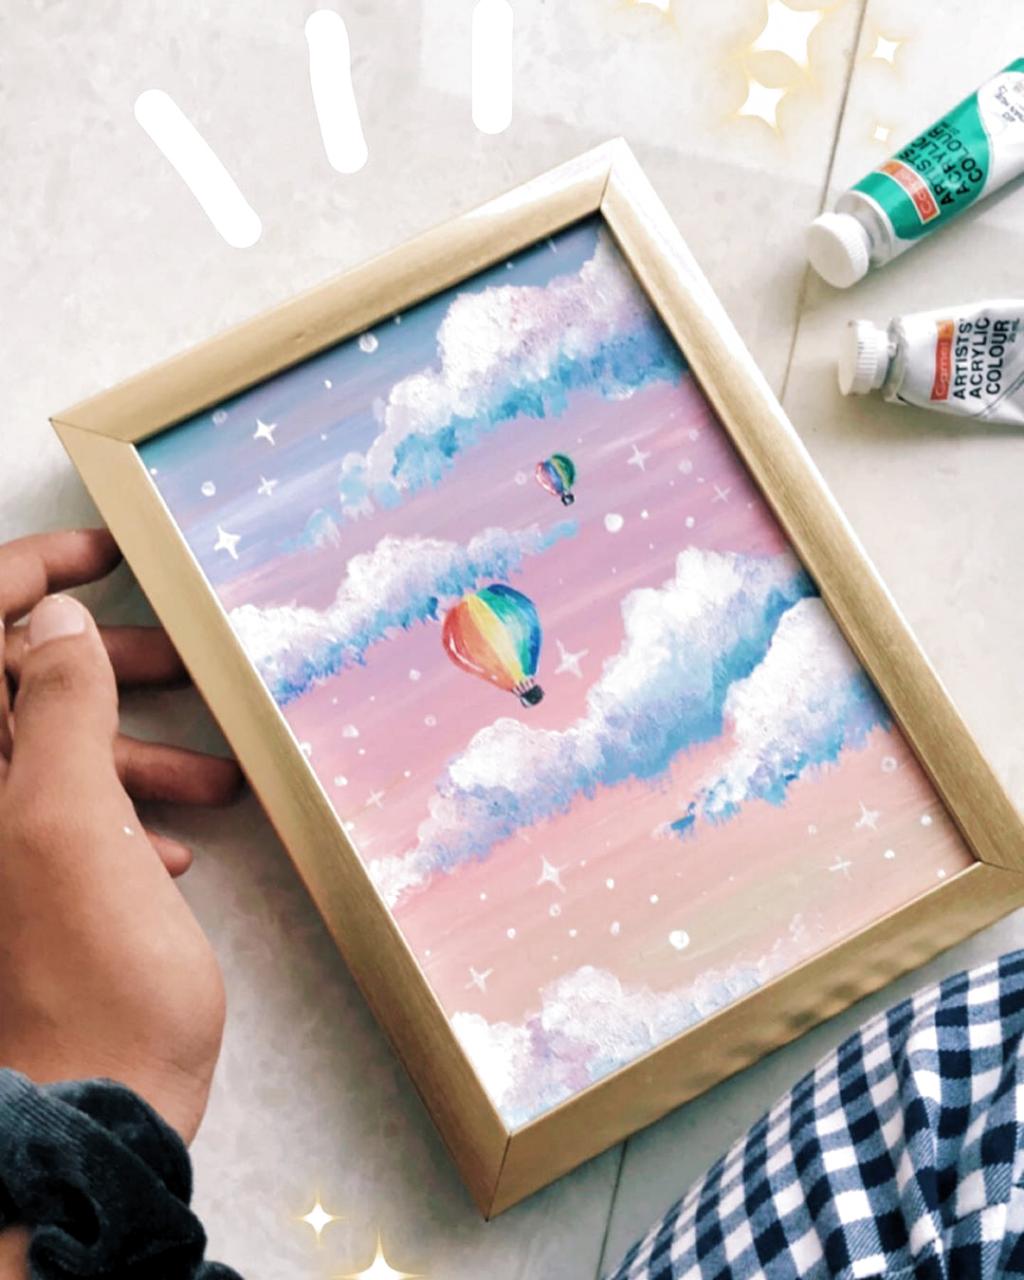 Acrylic Aesthetic Paintings : acrylic, aesthetic, paintings, Paint, #painting, #aesthetic, #pocketpainting, #acrylicpaint, #acrylicpainting, Aesthetics, #artfeatur…, Canvas, Acrylic, Painting, Canvas,, Small